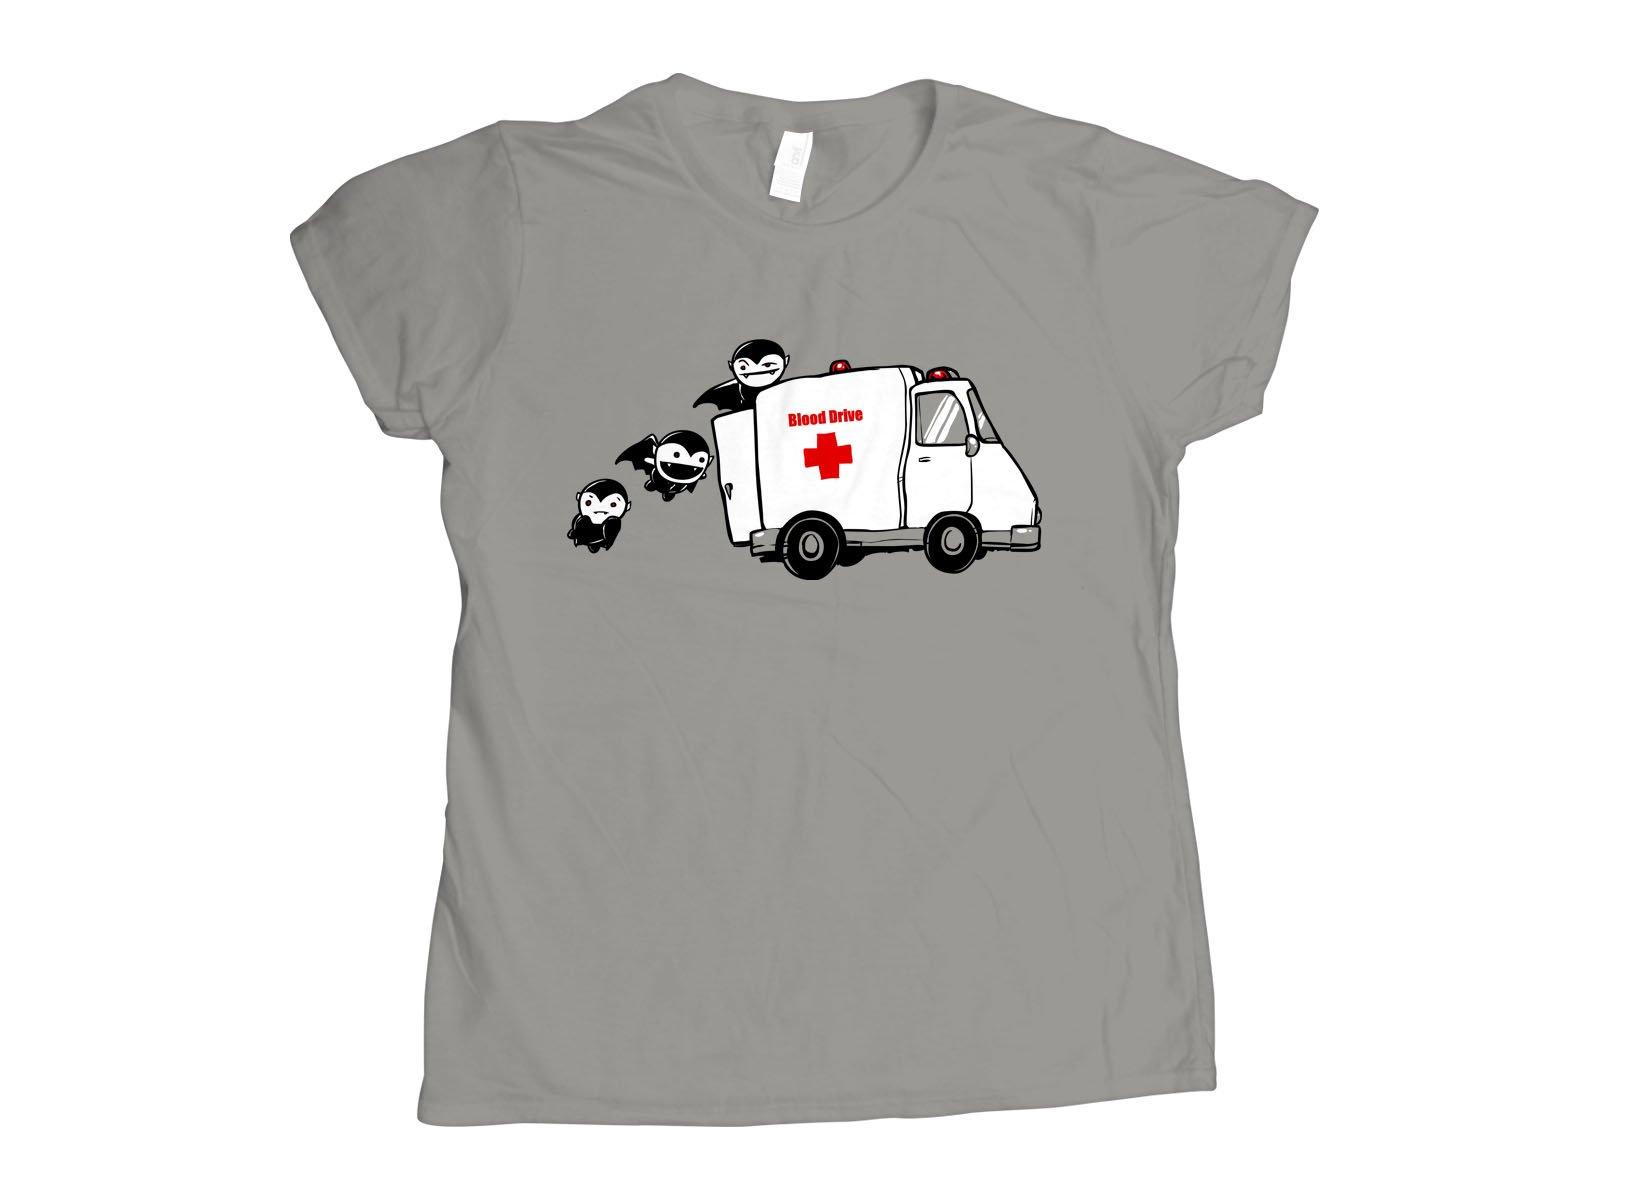 Blood Drive Vampires on Womens T-Shirt